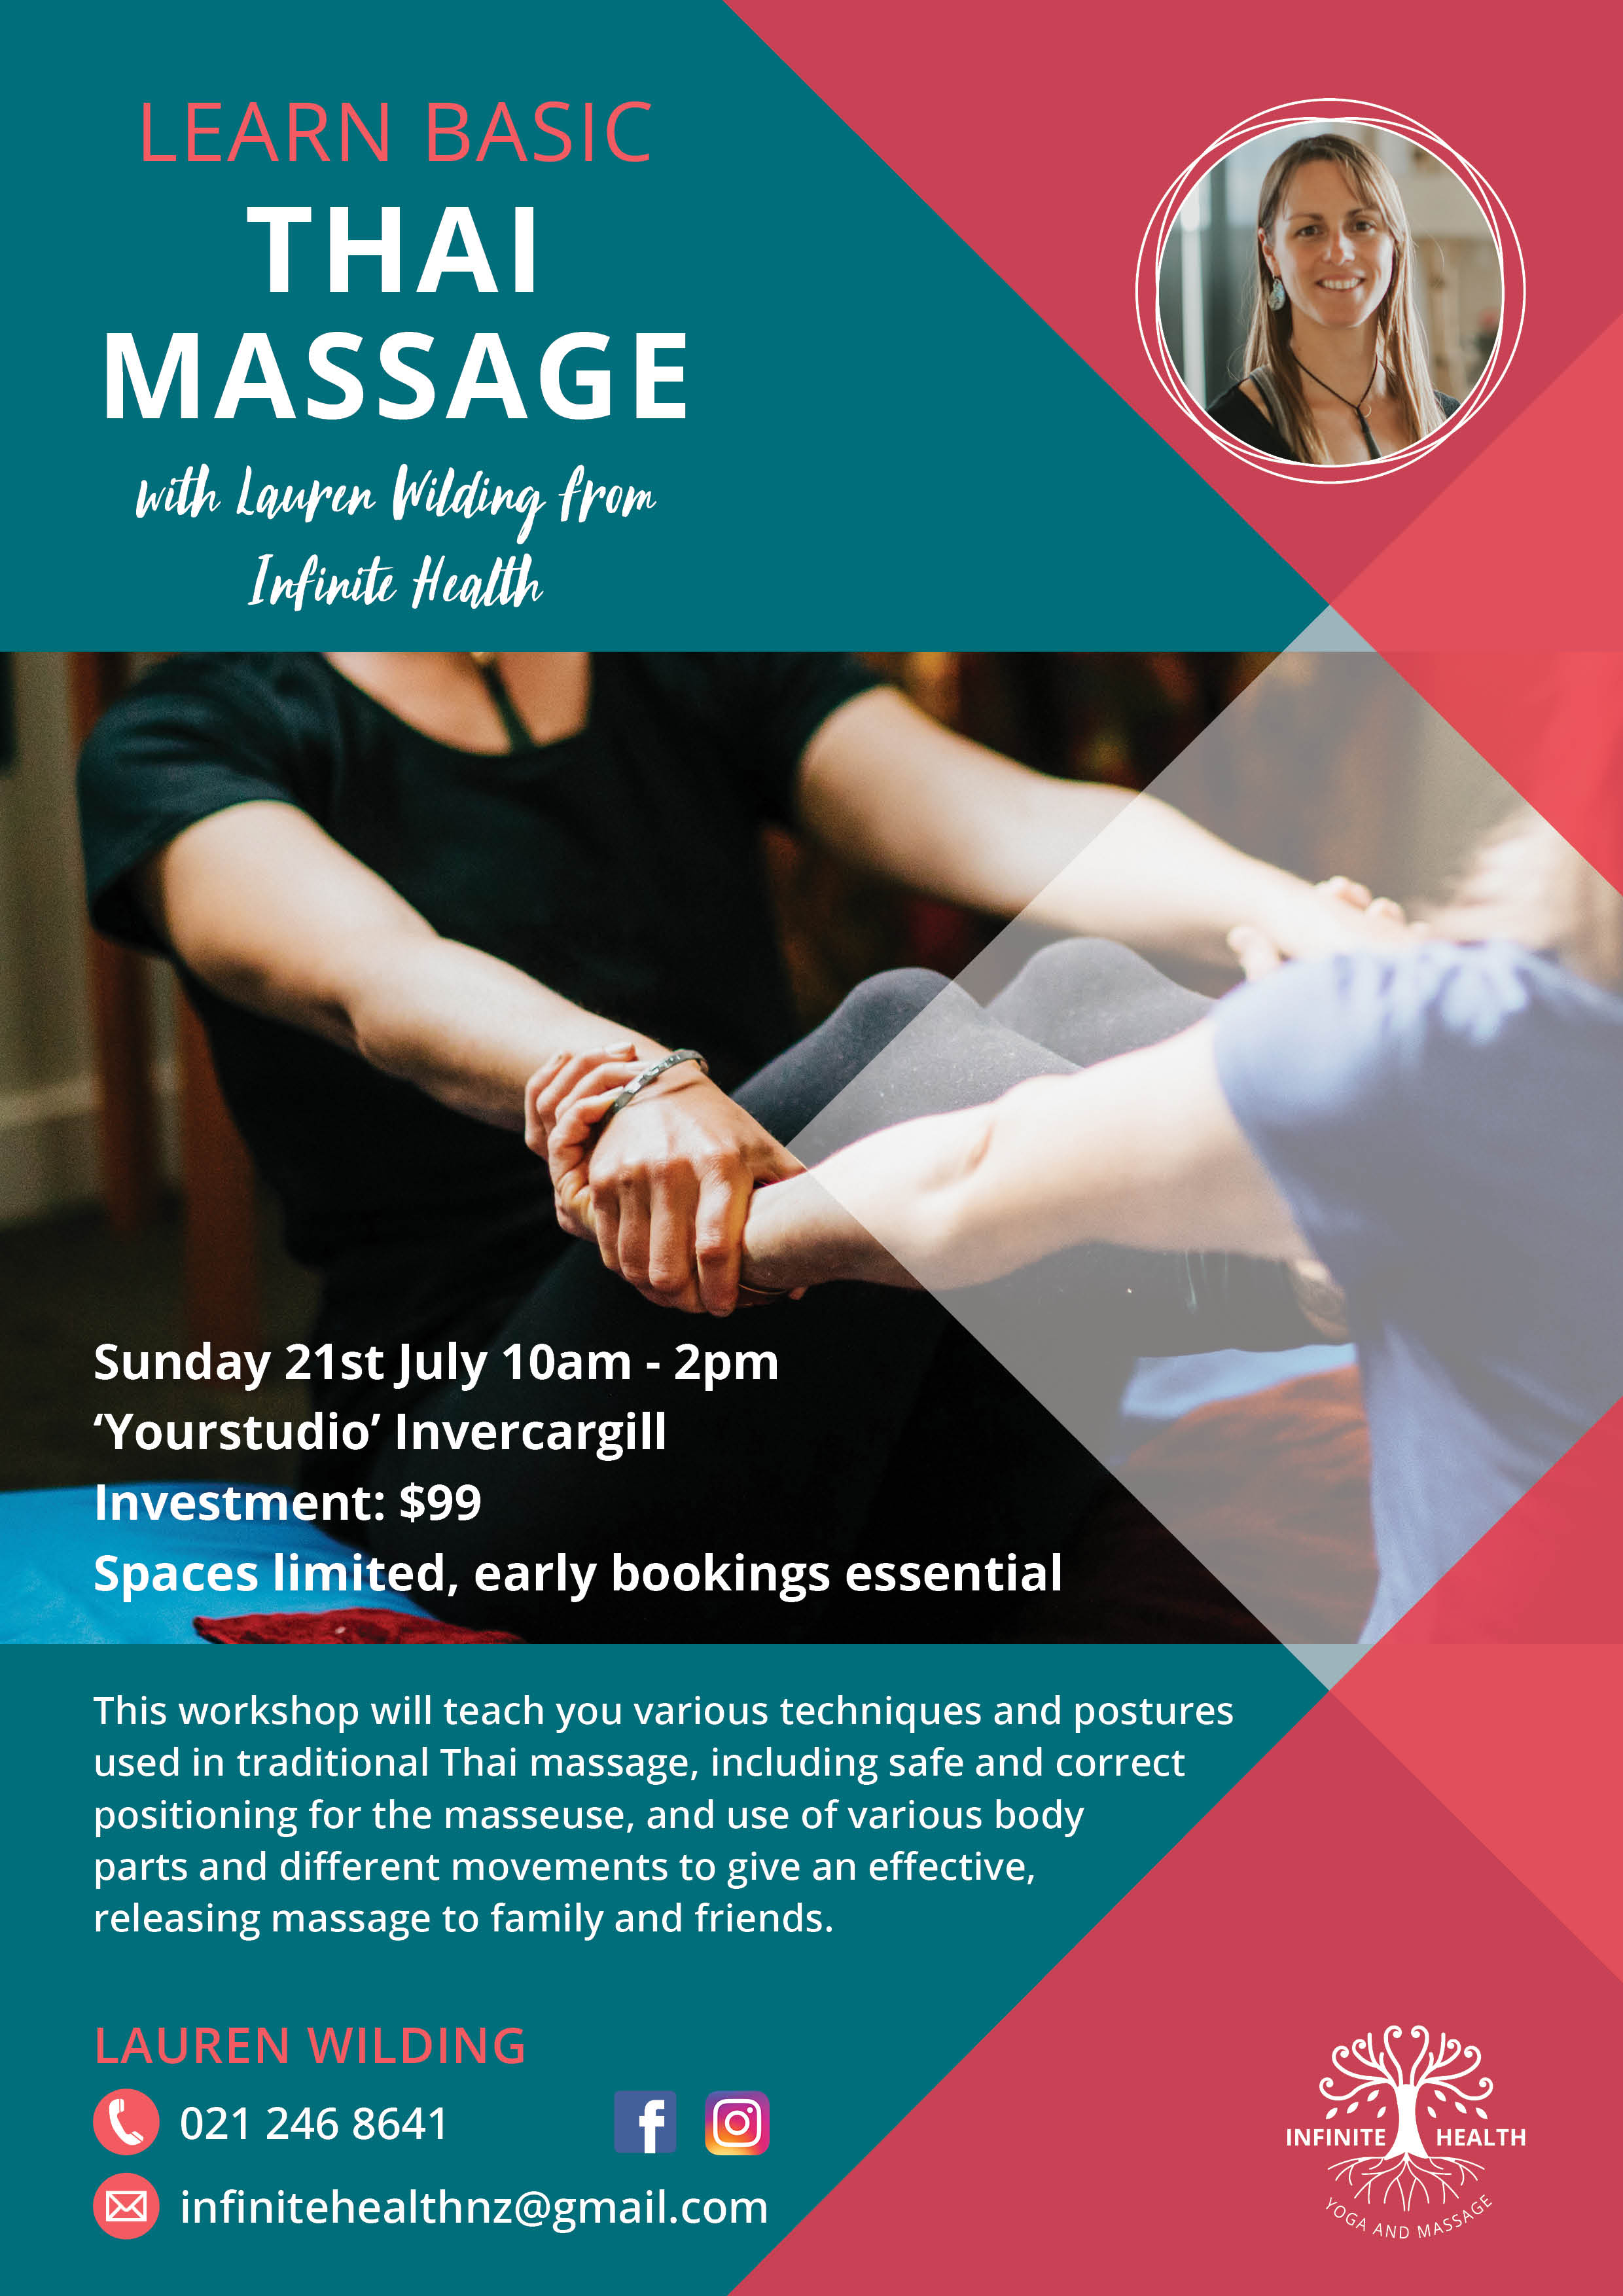 Learn Basic Thai Massage Workshop — Your Studio